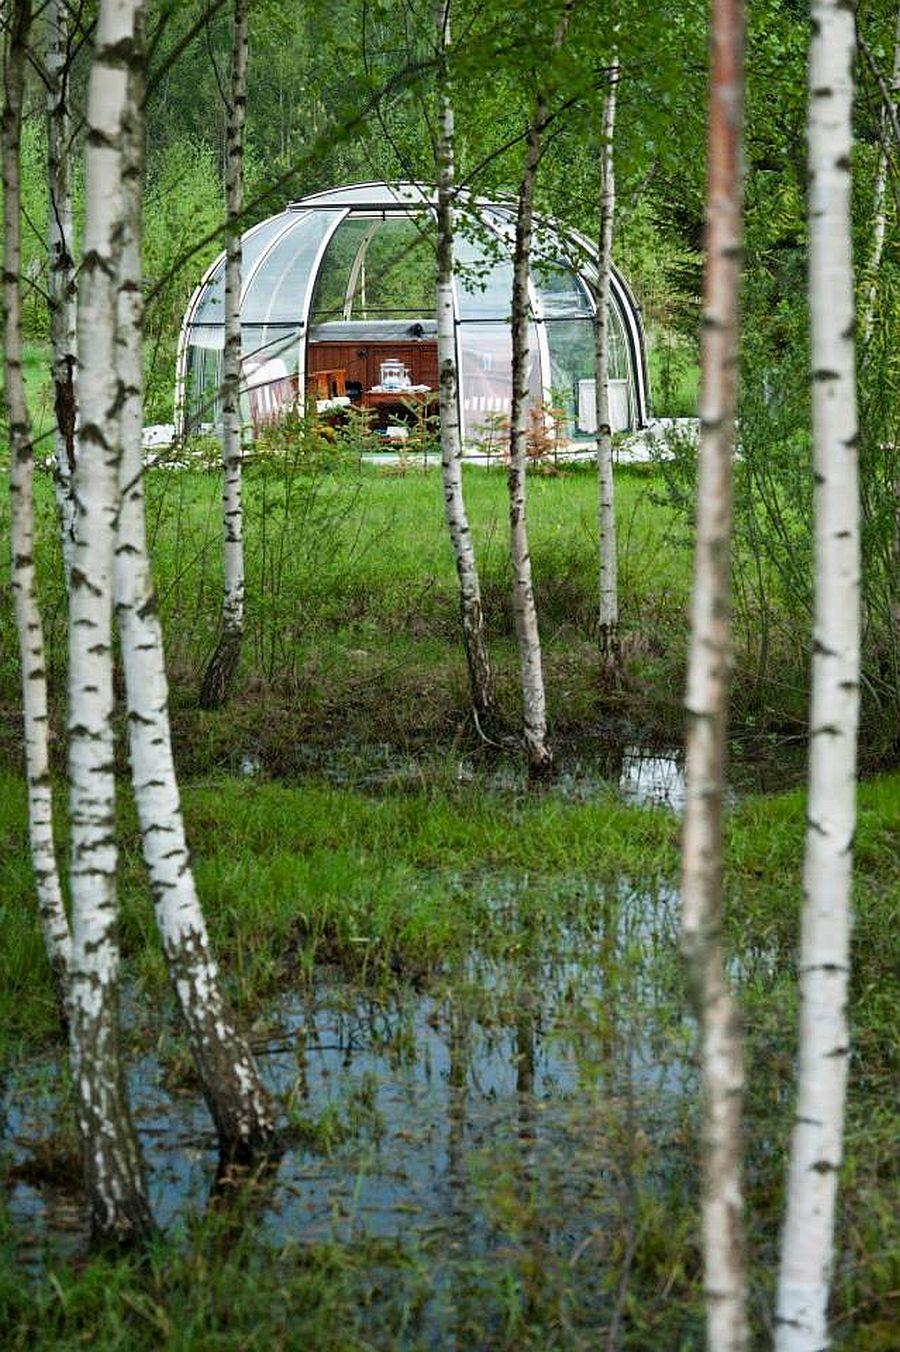 adelaparvu.com despre pensiunea turistica, casa in stil rustic, Mazurskie Siedlisko Kruklin, Polonia (17)